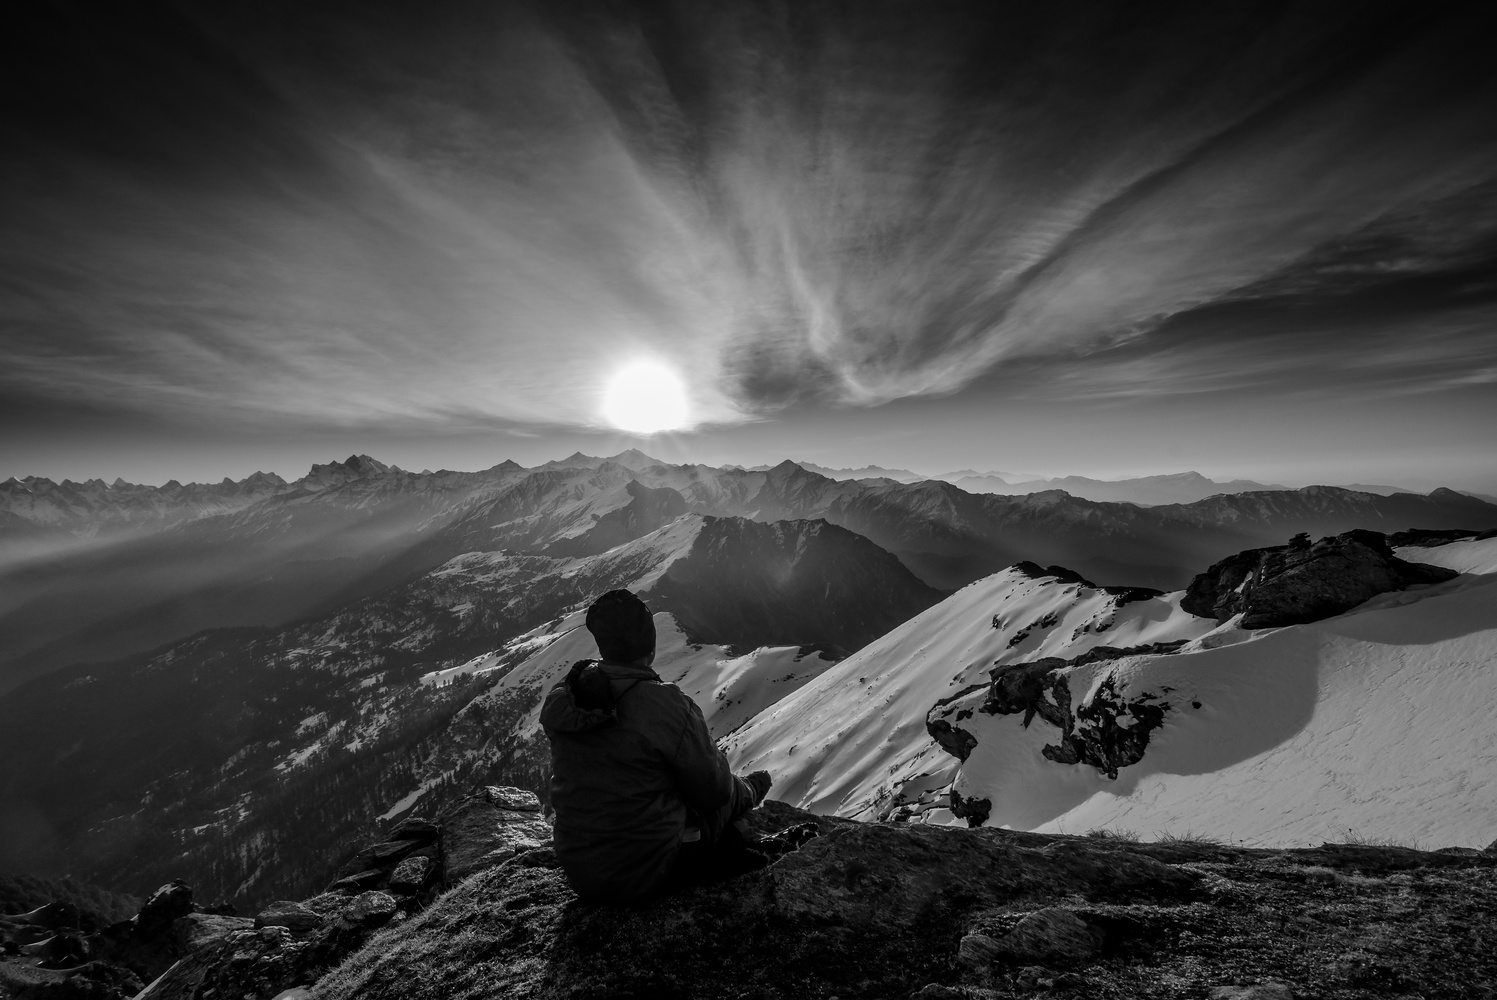 The Himalayan Sunrise by Anirban Bose